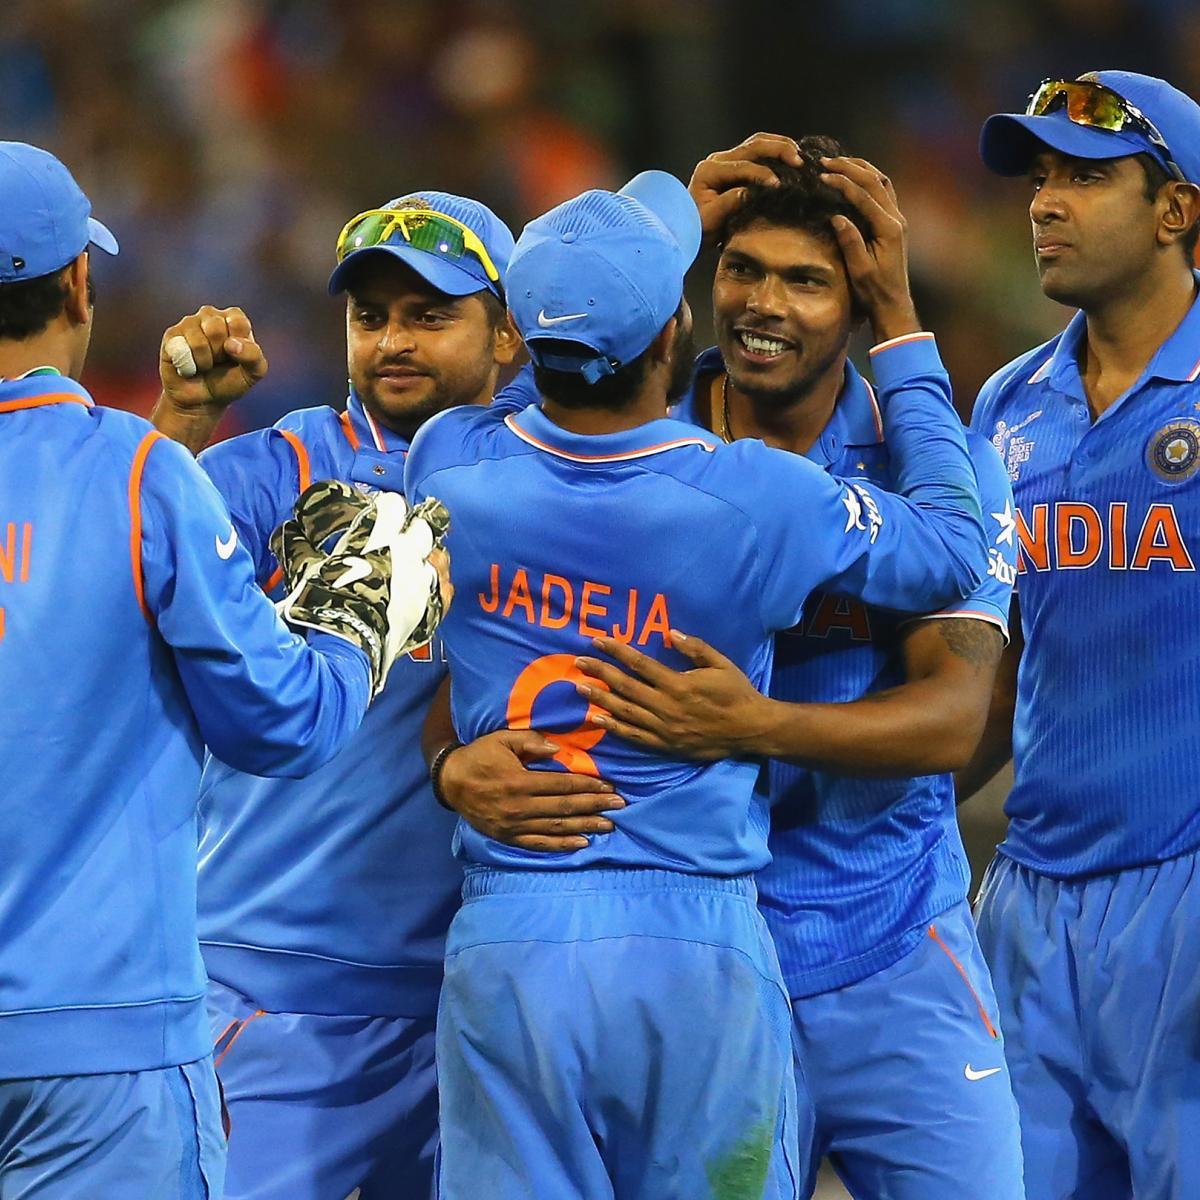 Cricket World Cup 2015 Schedule: Semi-Final Fixtures